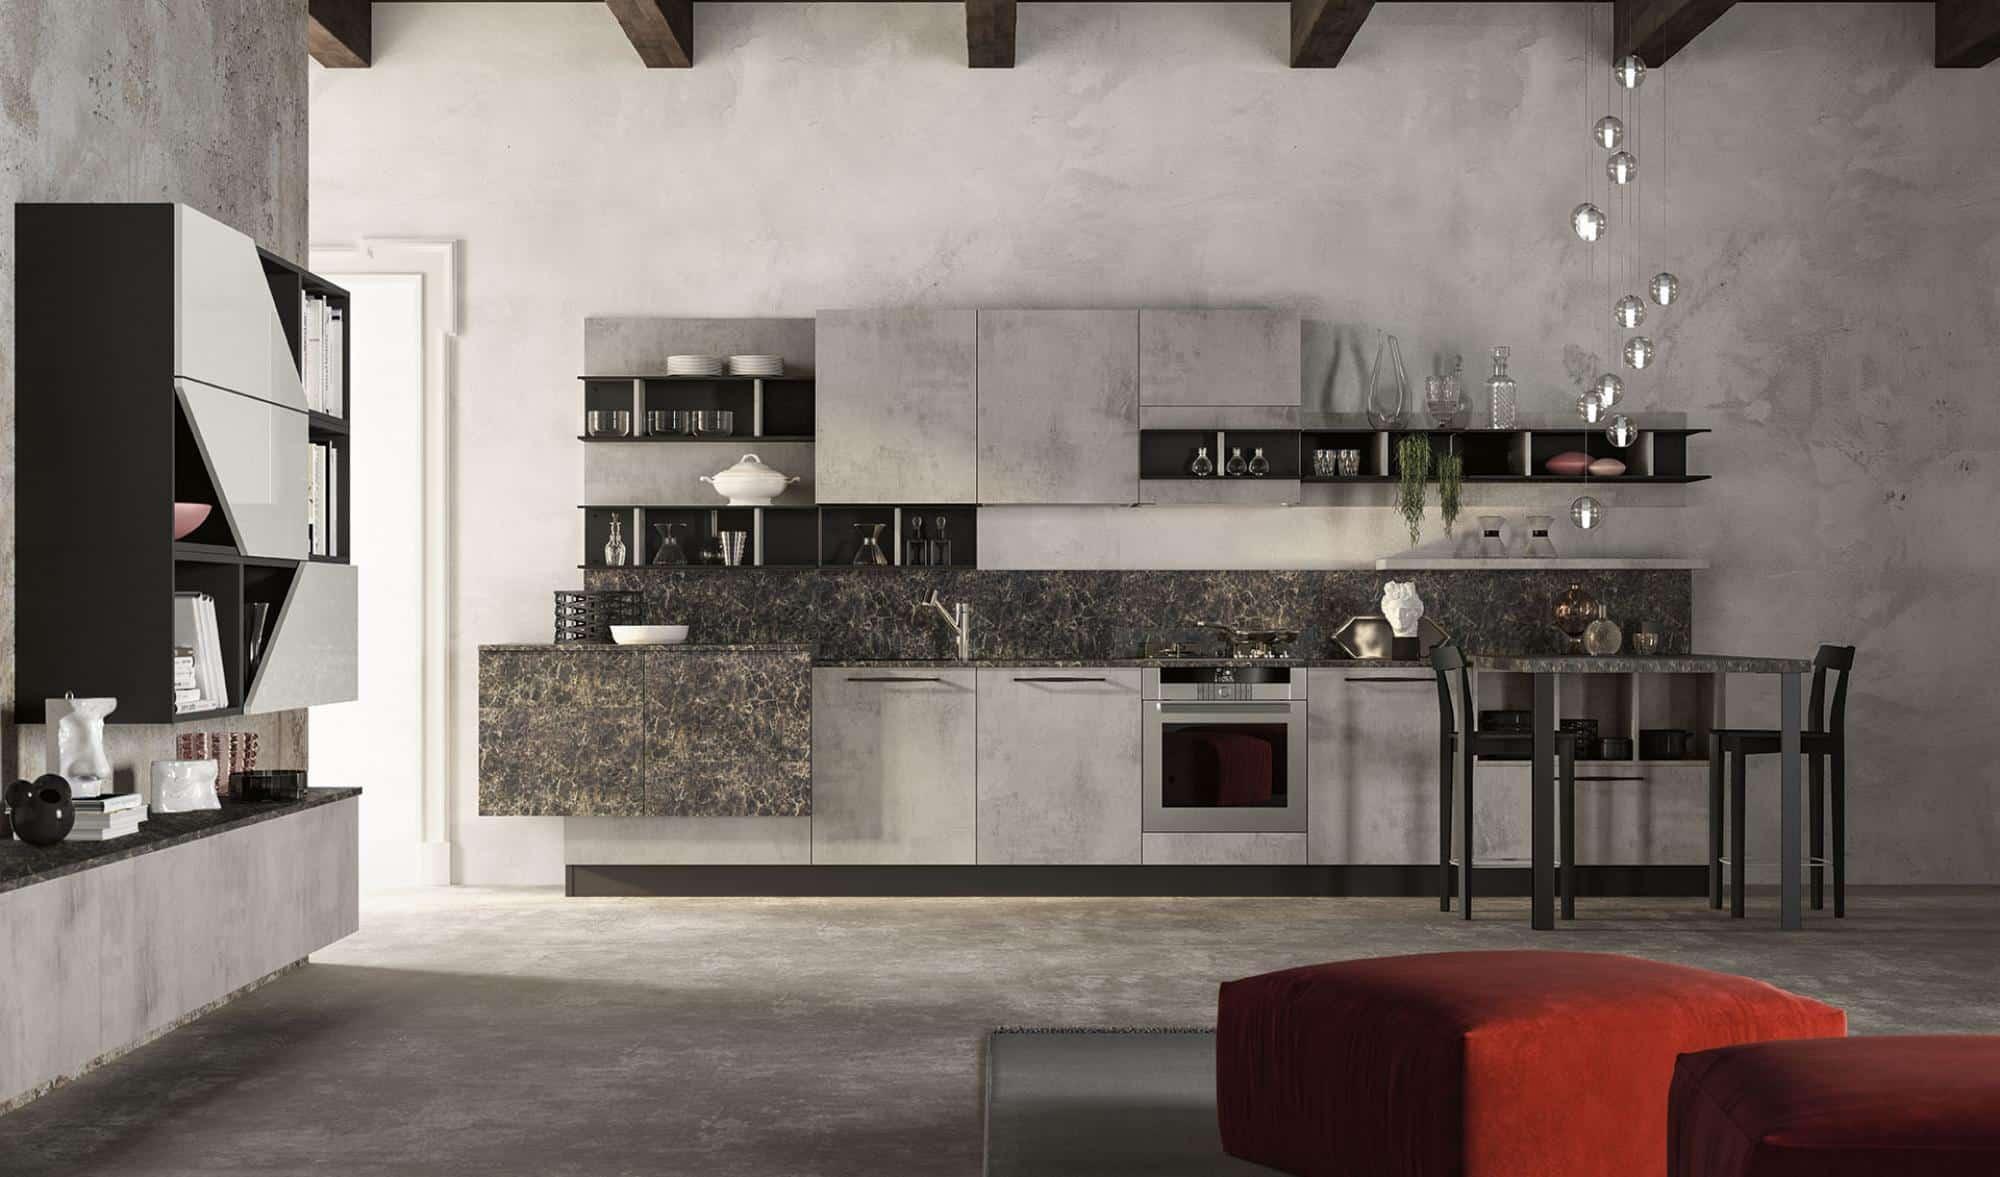 Lungomare κουζινα χωρις πομολο με υφη τσιμέντου και μάρμαρου